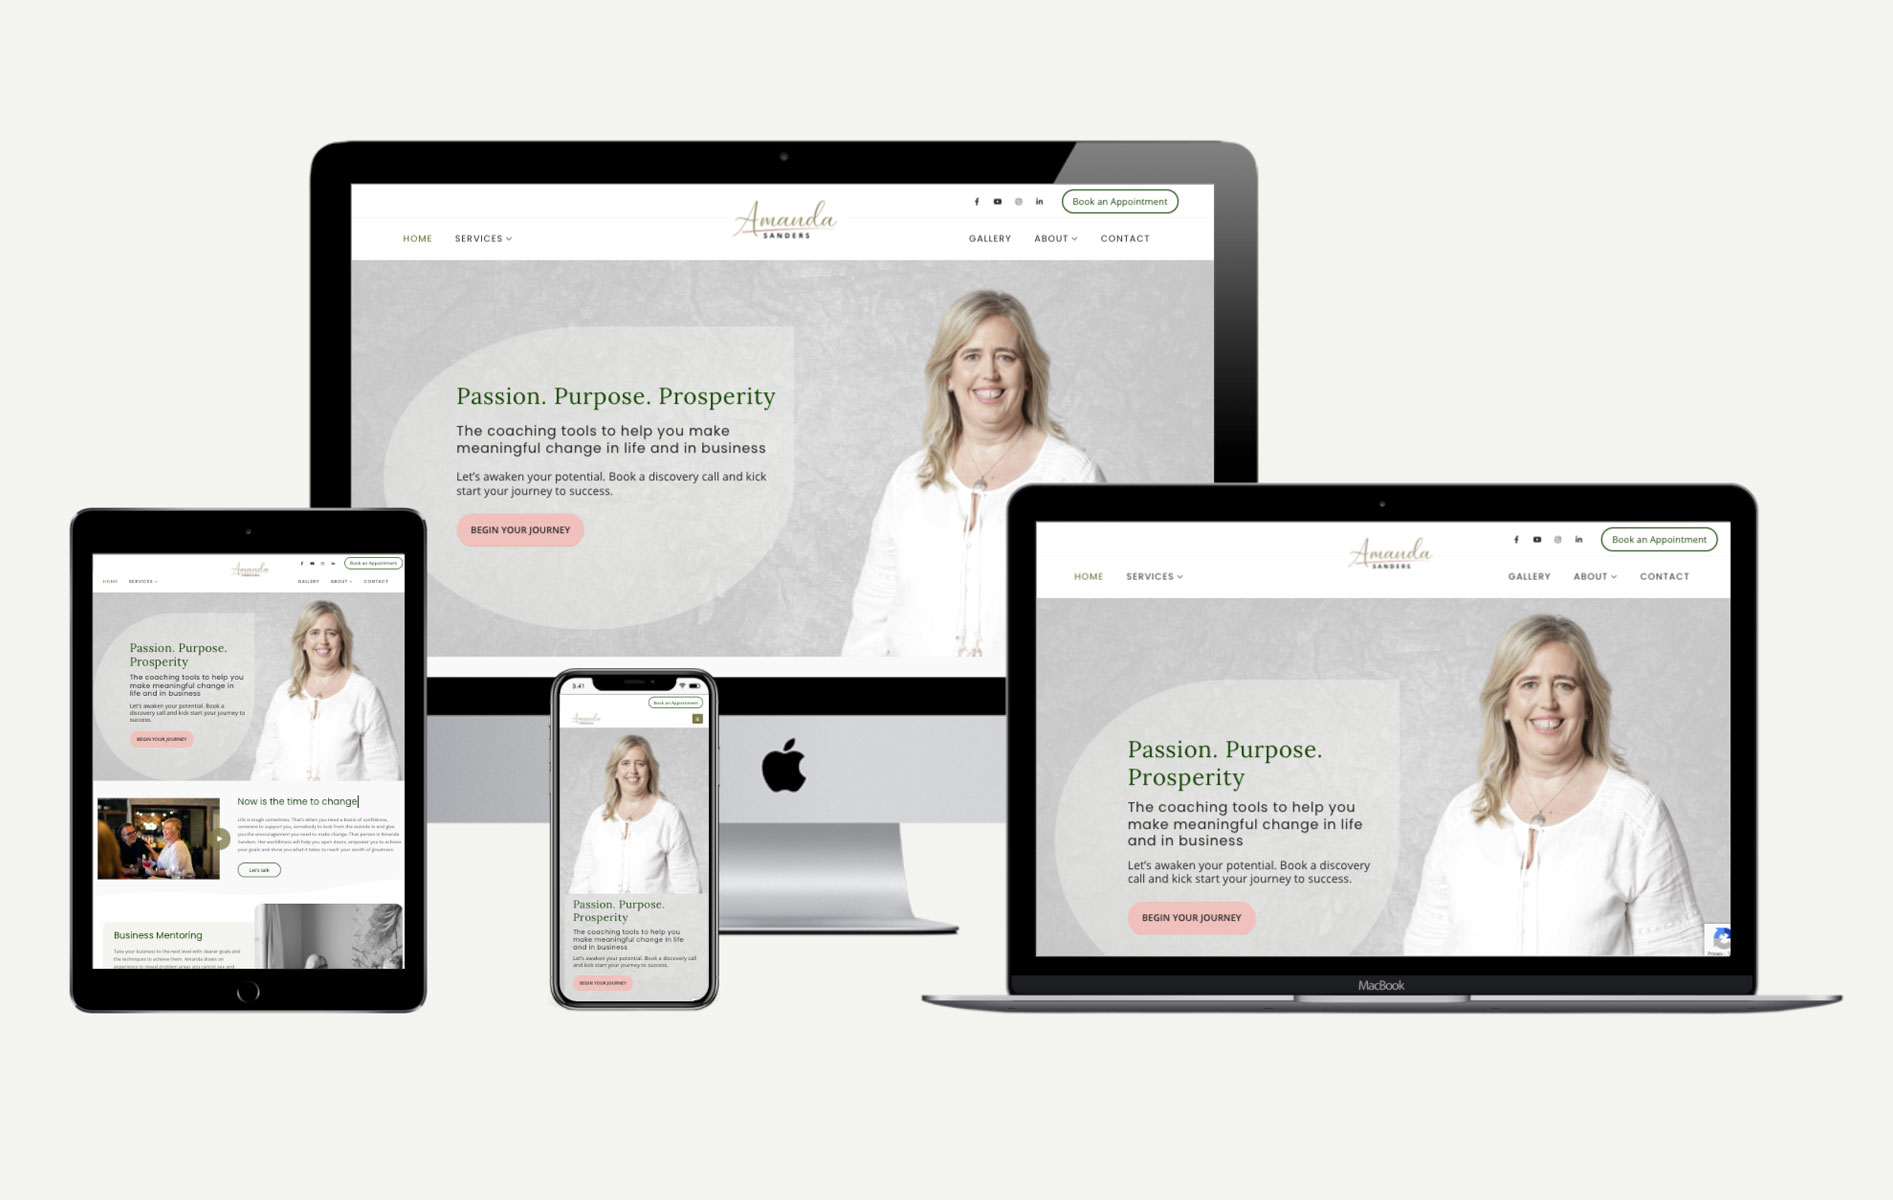 Another Website Design Project for Amanda Sanders